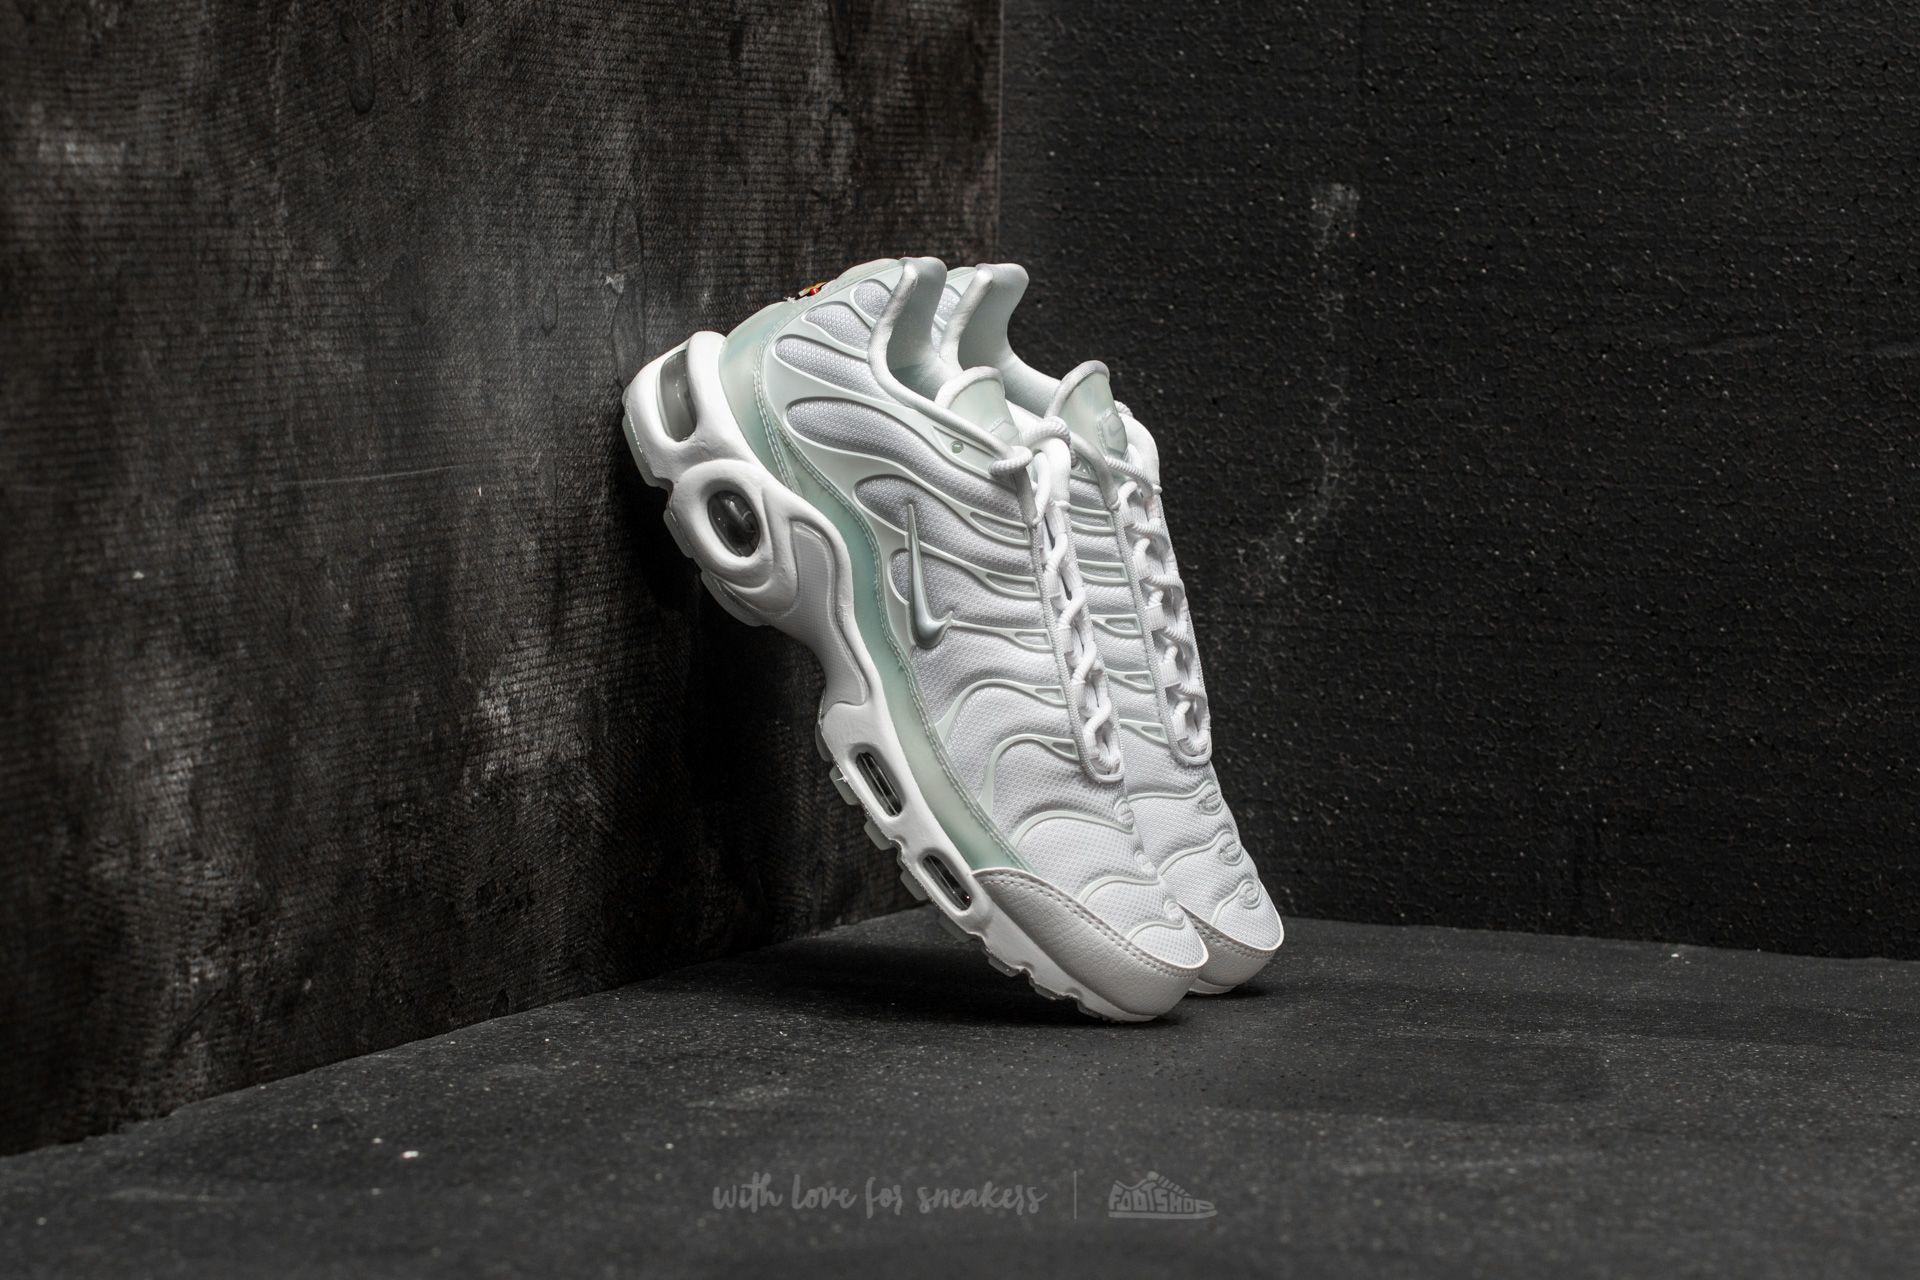 daf08023dd2 Nike WMNS Air Max Plus SE White  Pure Platinum-Ice